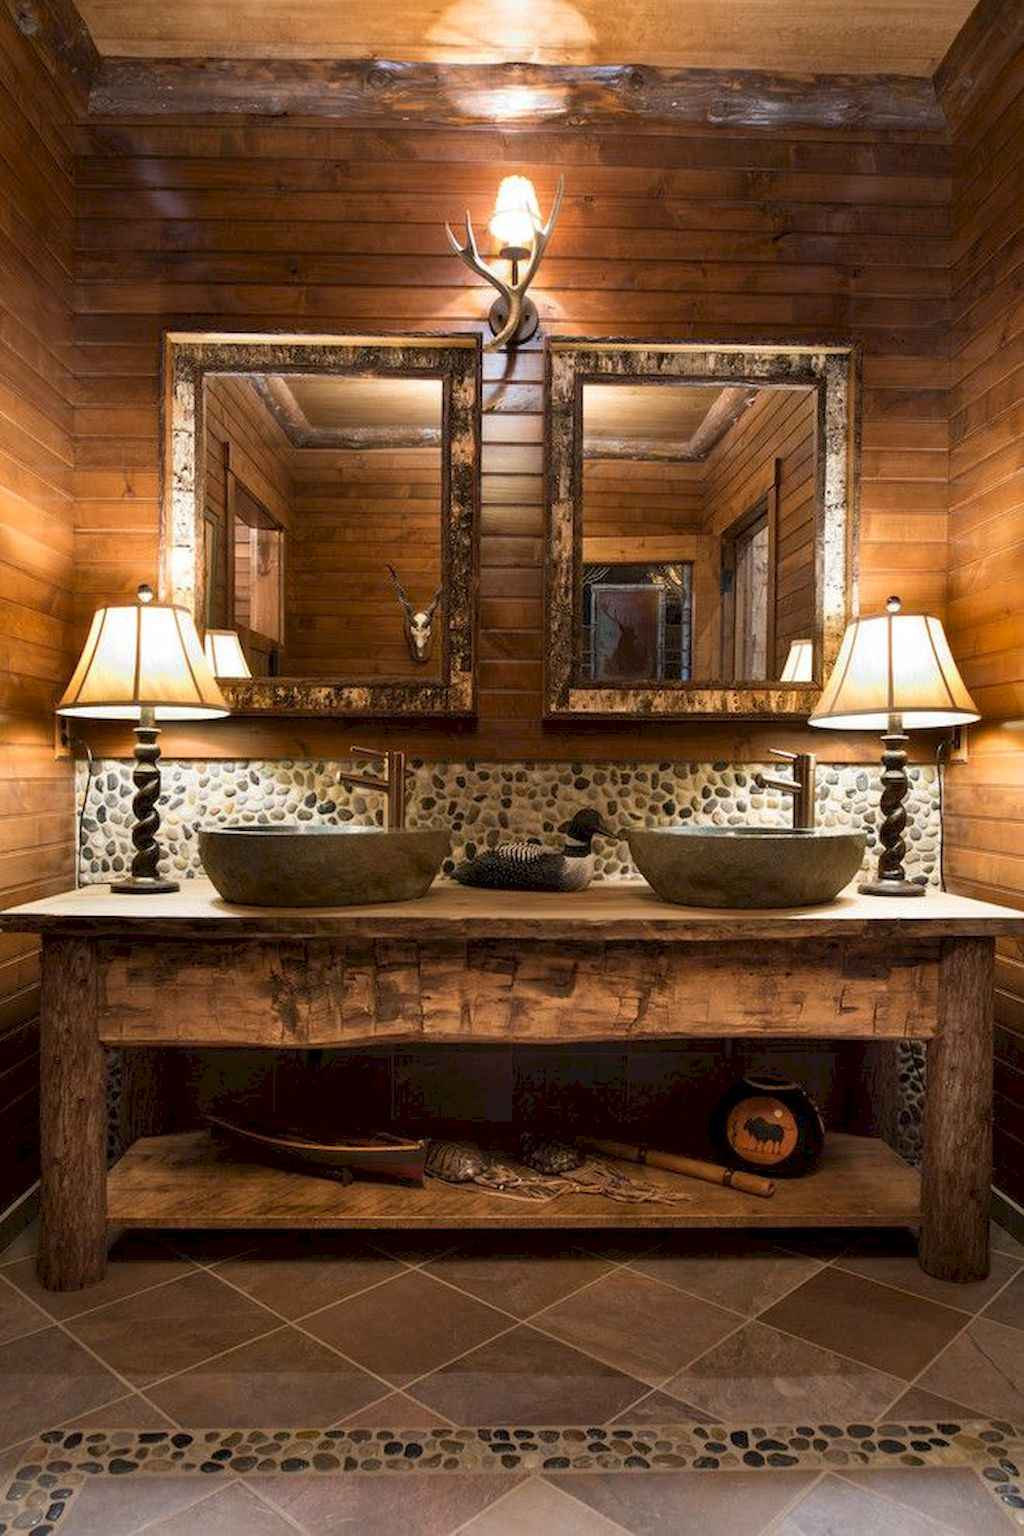 Inspiring rustic bathroom decor ideas (21)